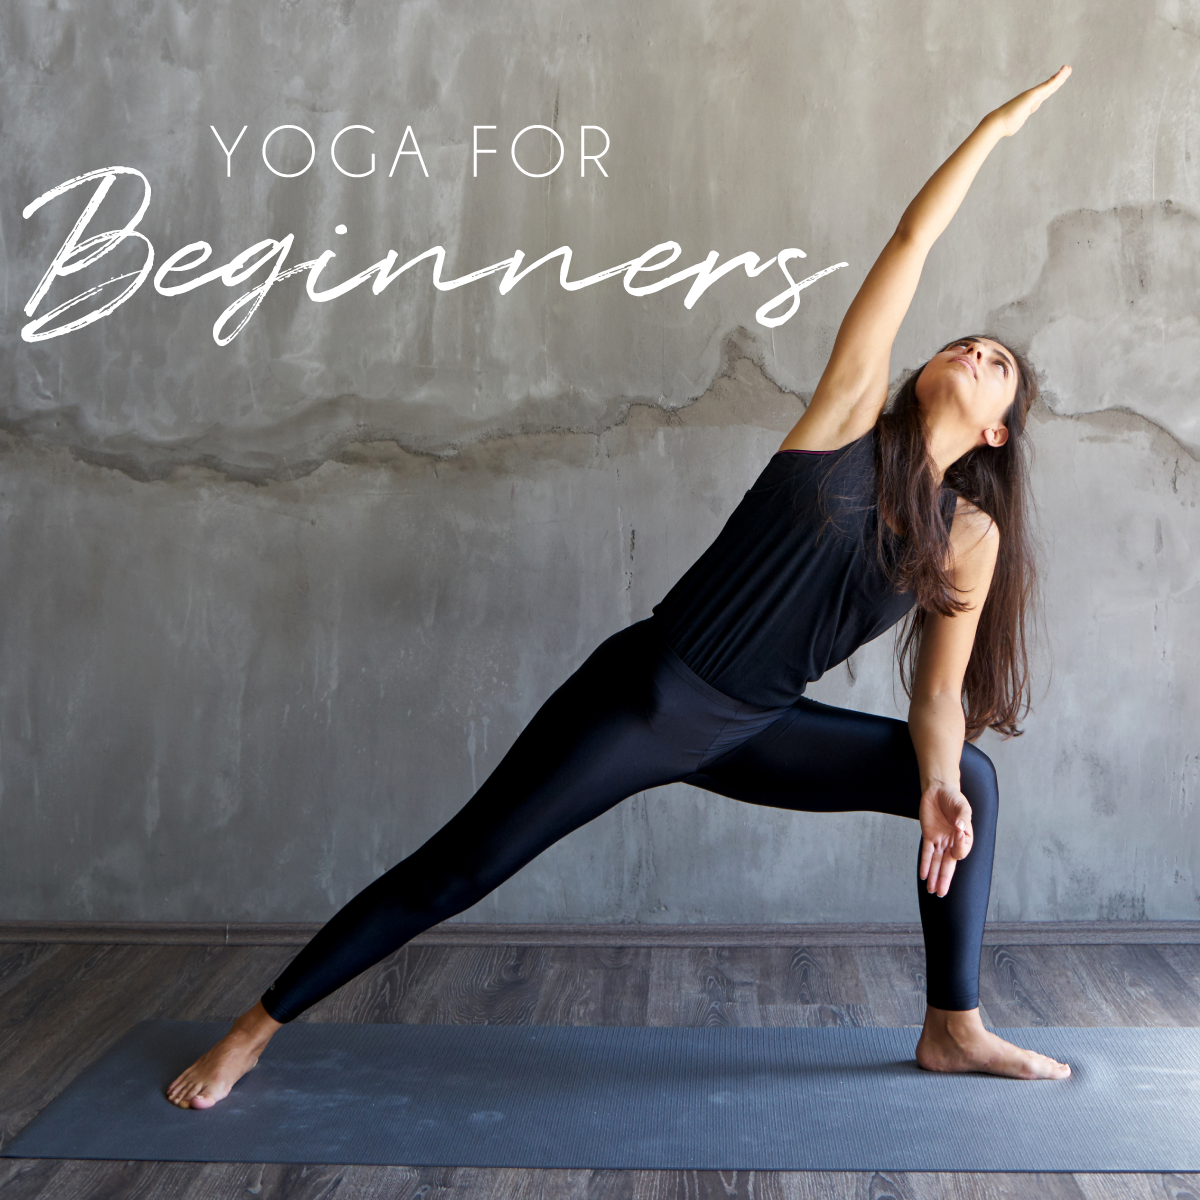 Beginner's Yoga Workshop | Red Skies Yoga, Jacksonville FL